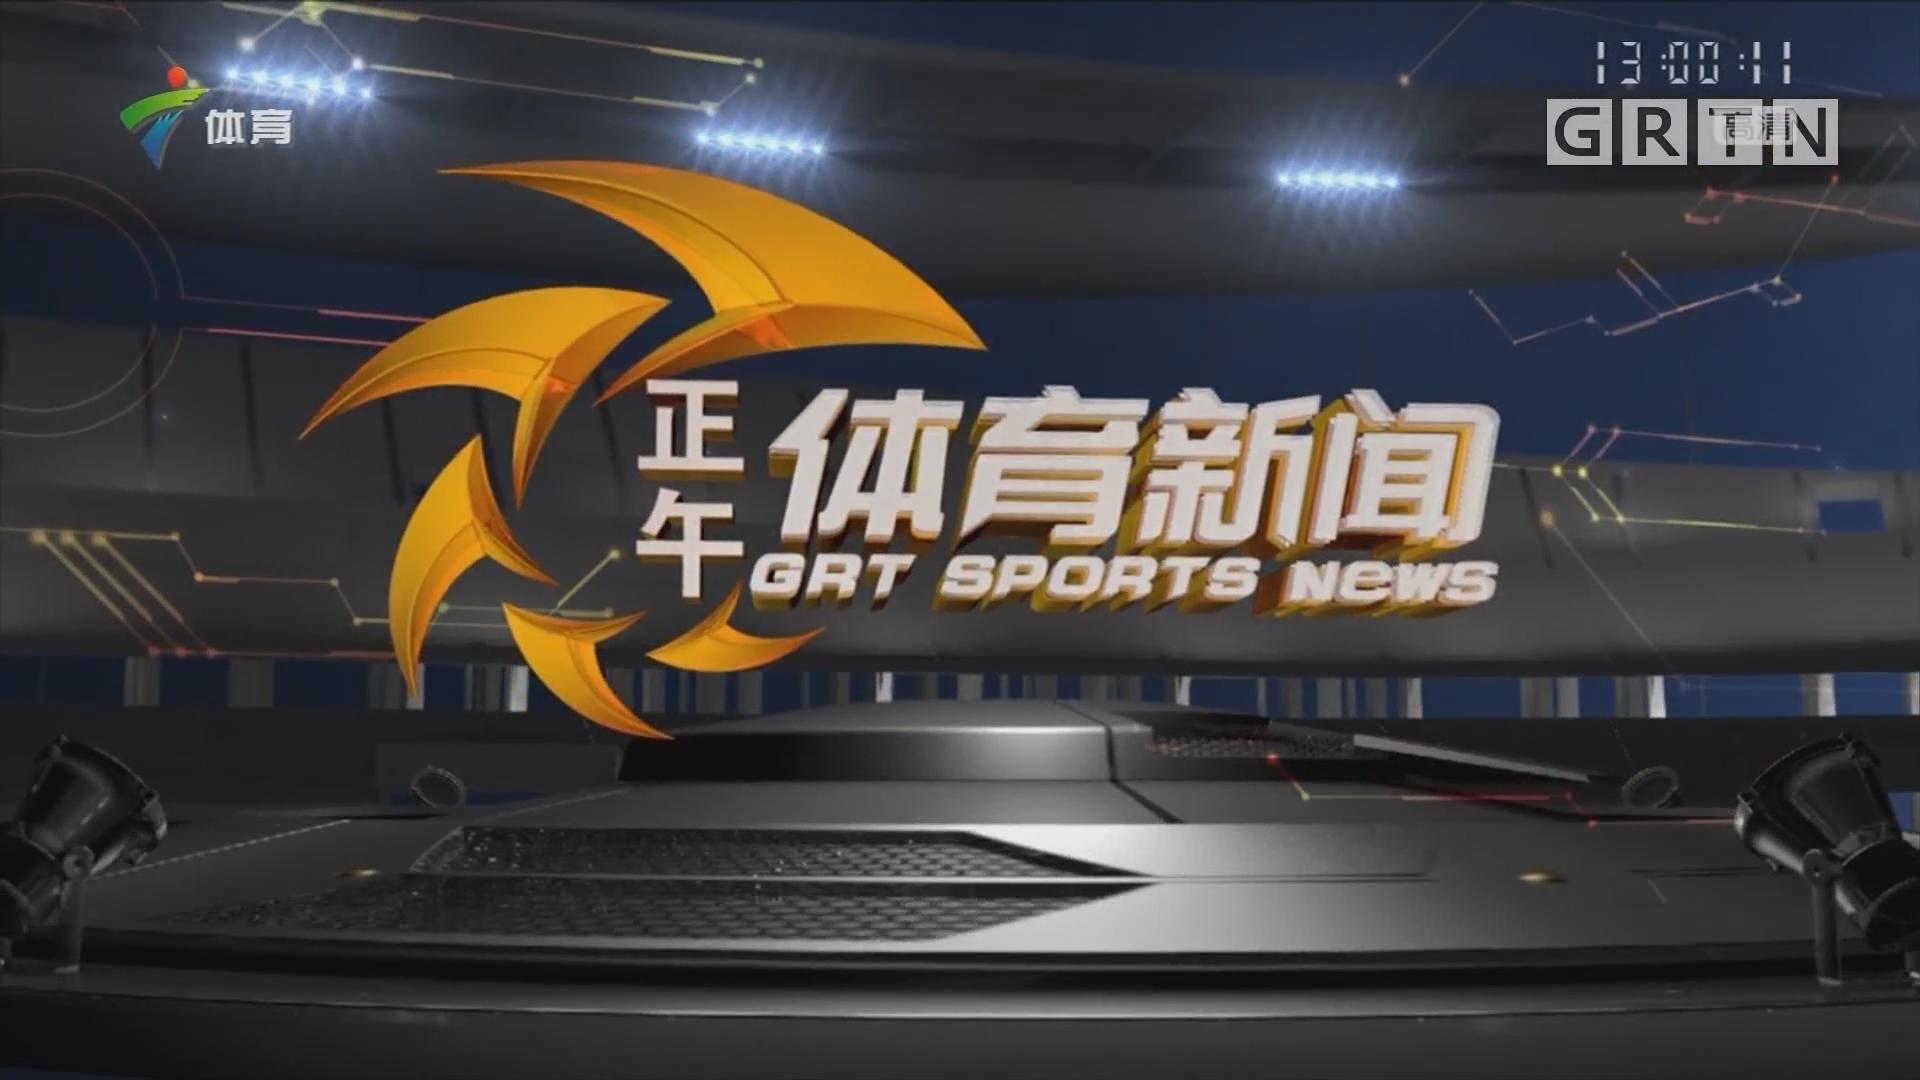 [HD][2019-03-30]正午体育新闻:卡纳瓦罗:时刻监控恒大训练状况